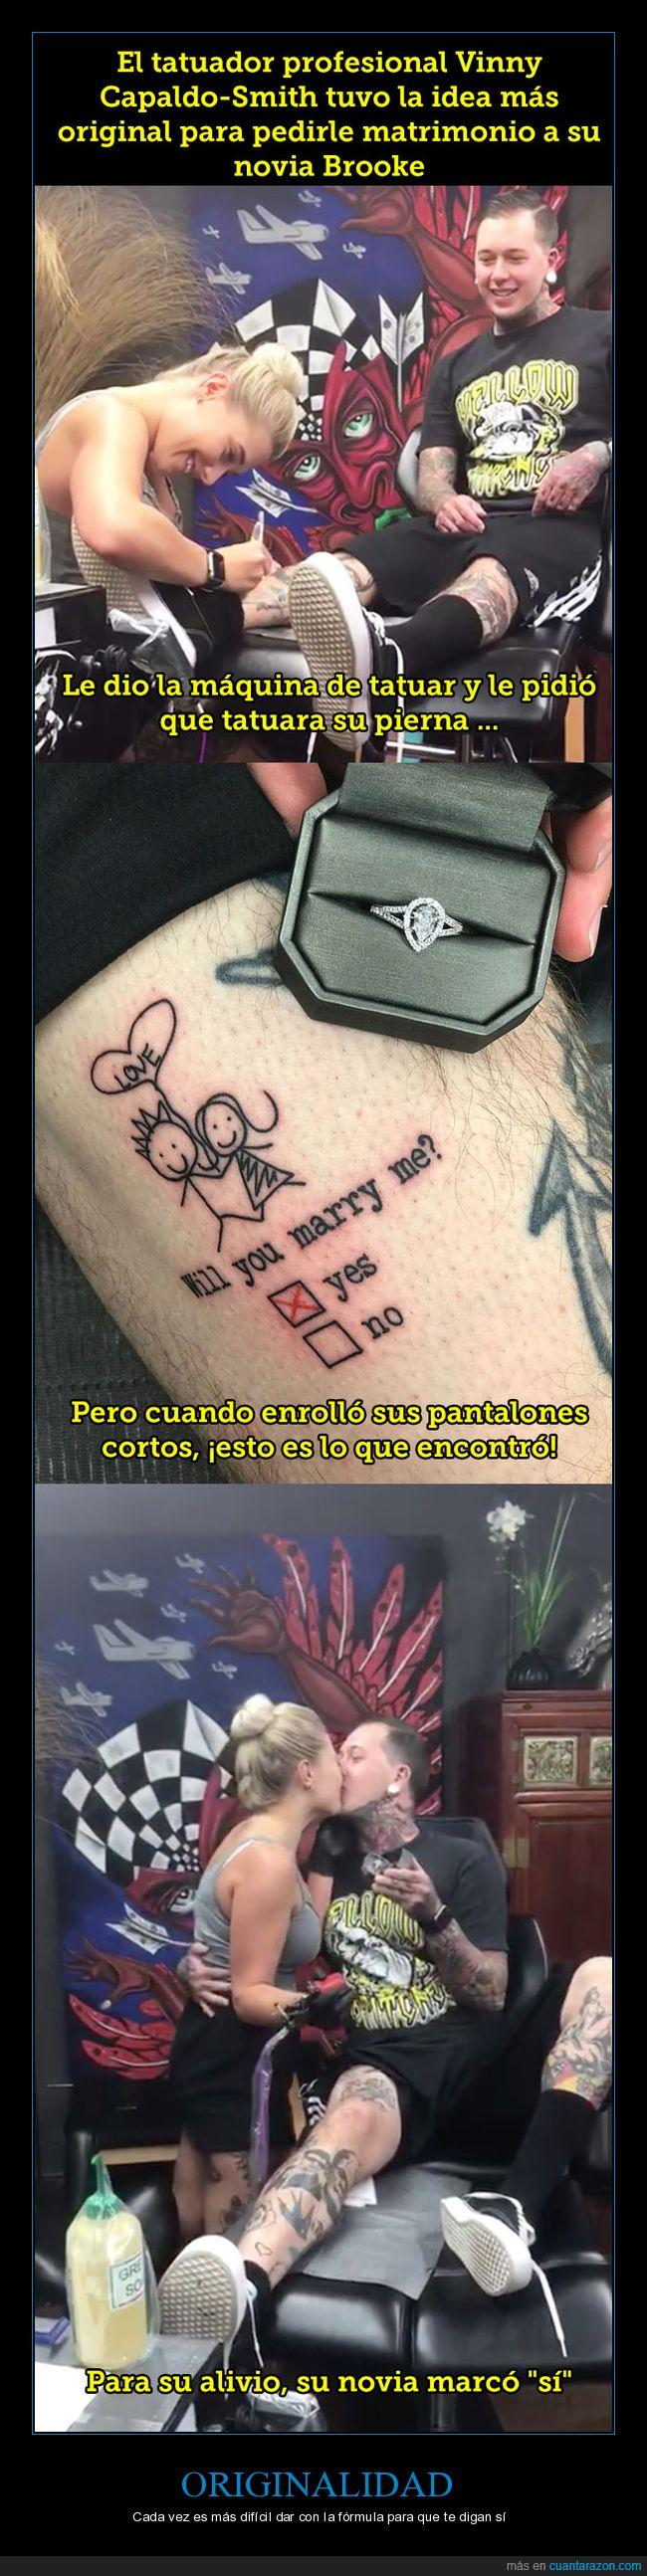 no,pierna,propuesta de matrimonio,sí,tatuaje